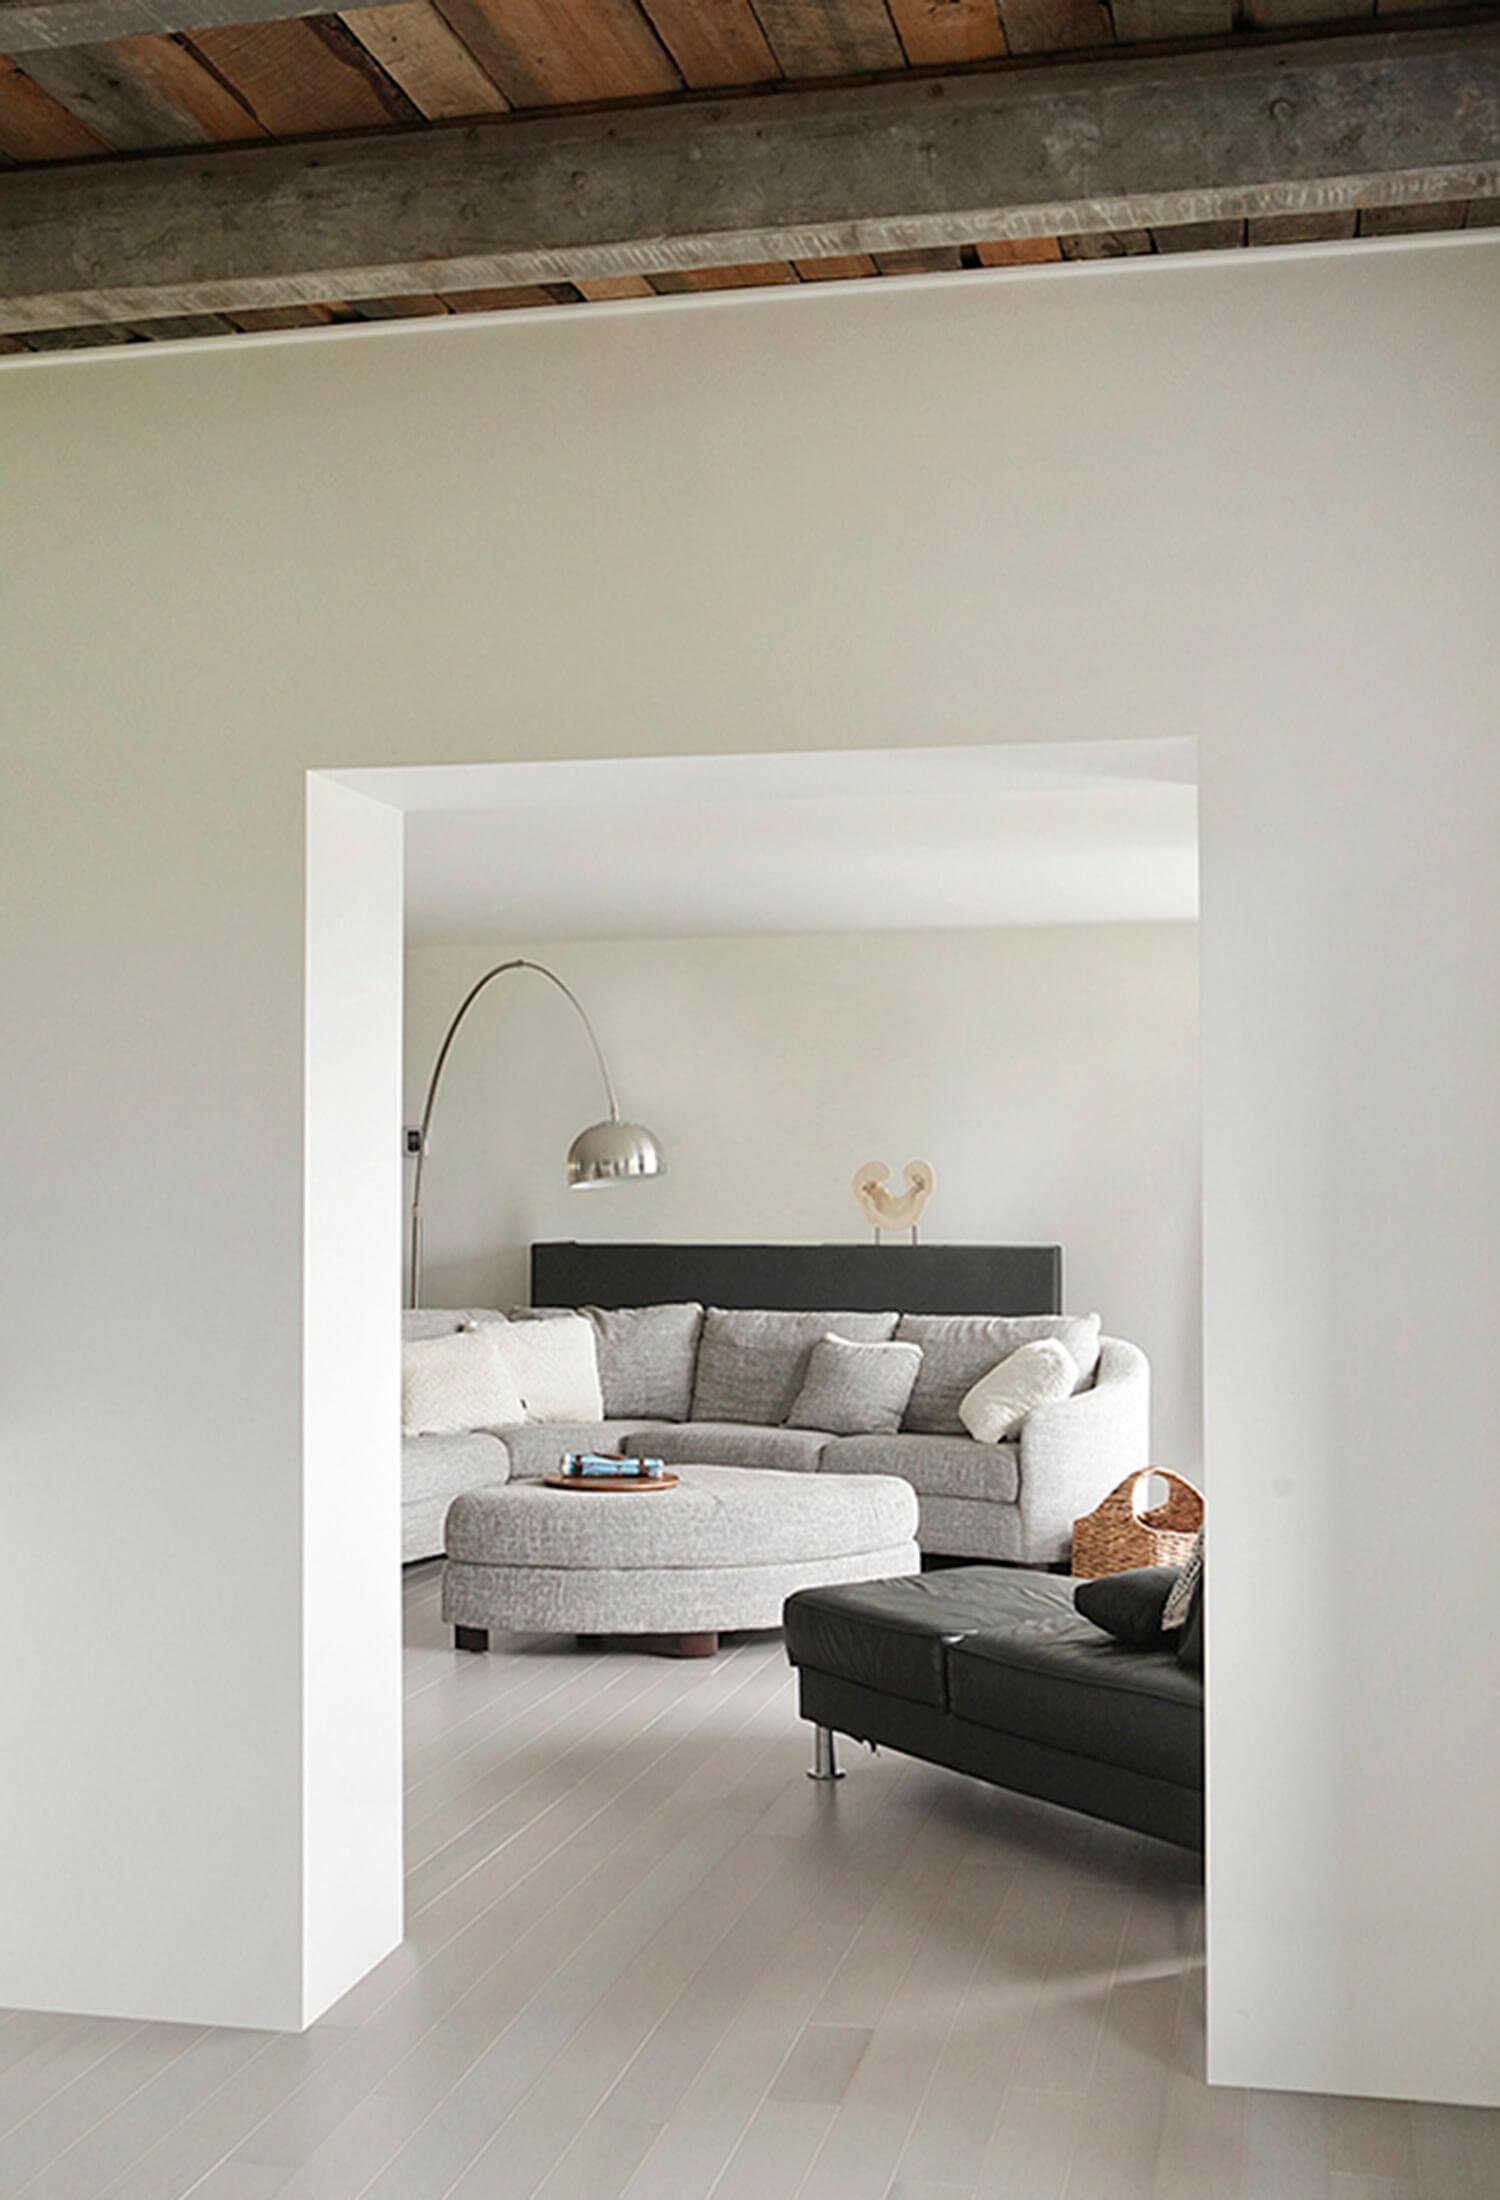 est living arbalete residence appareil archicture